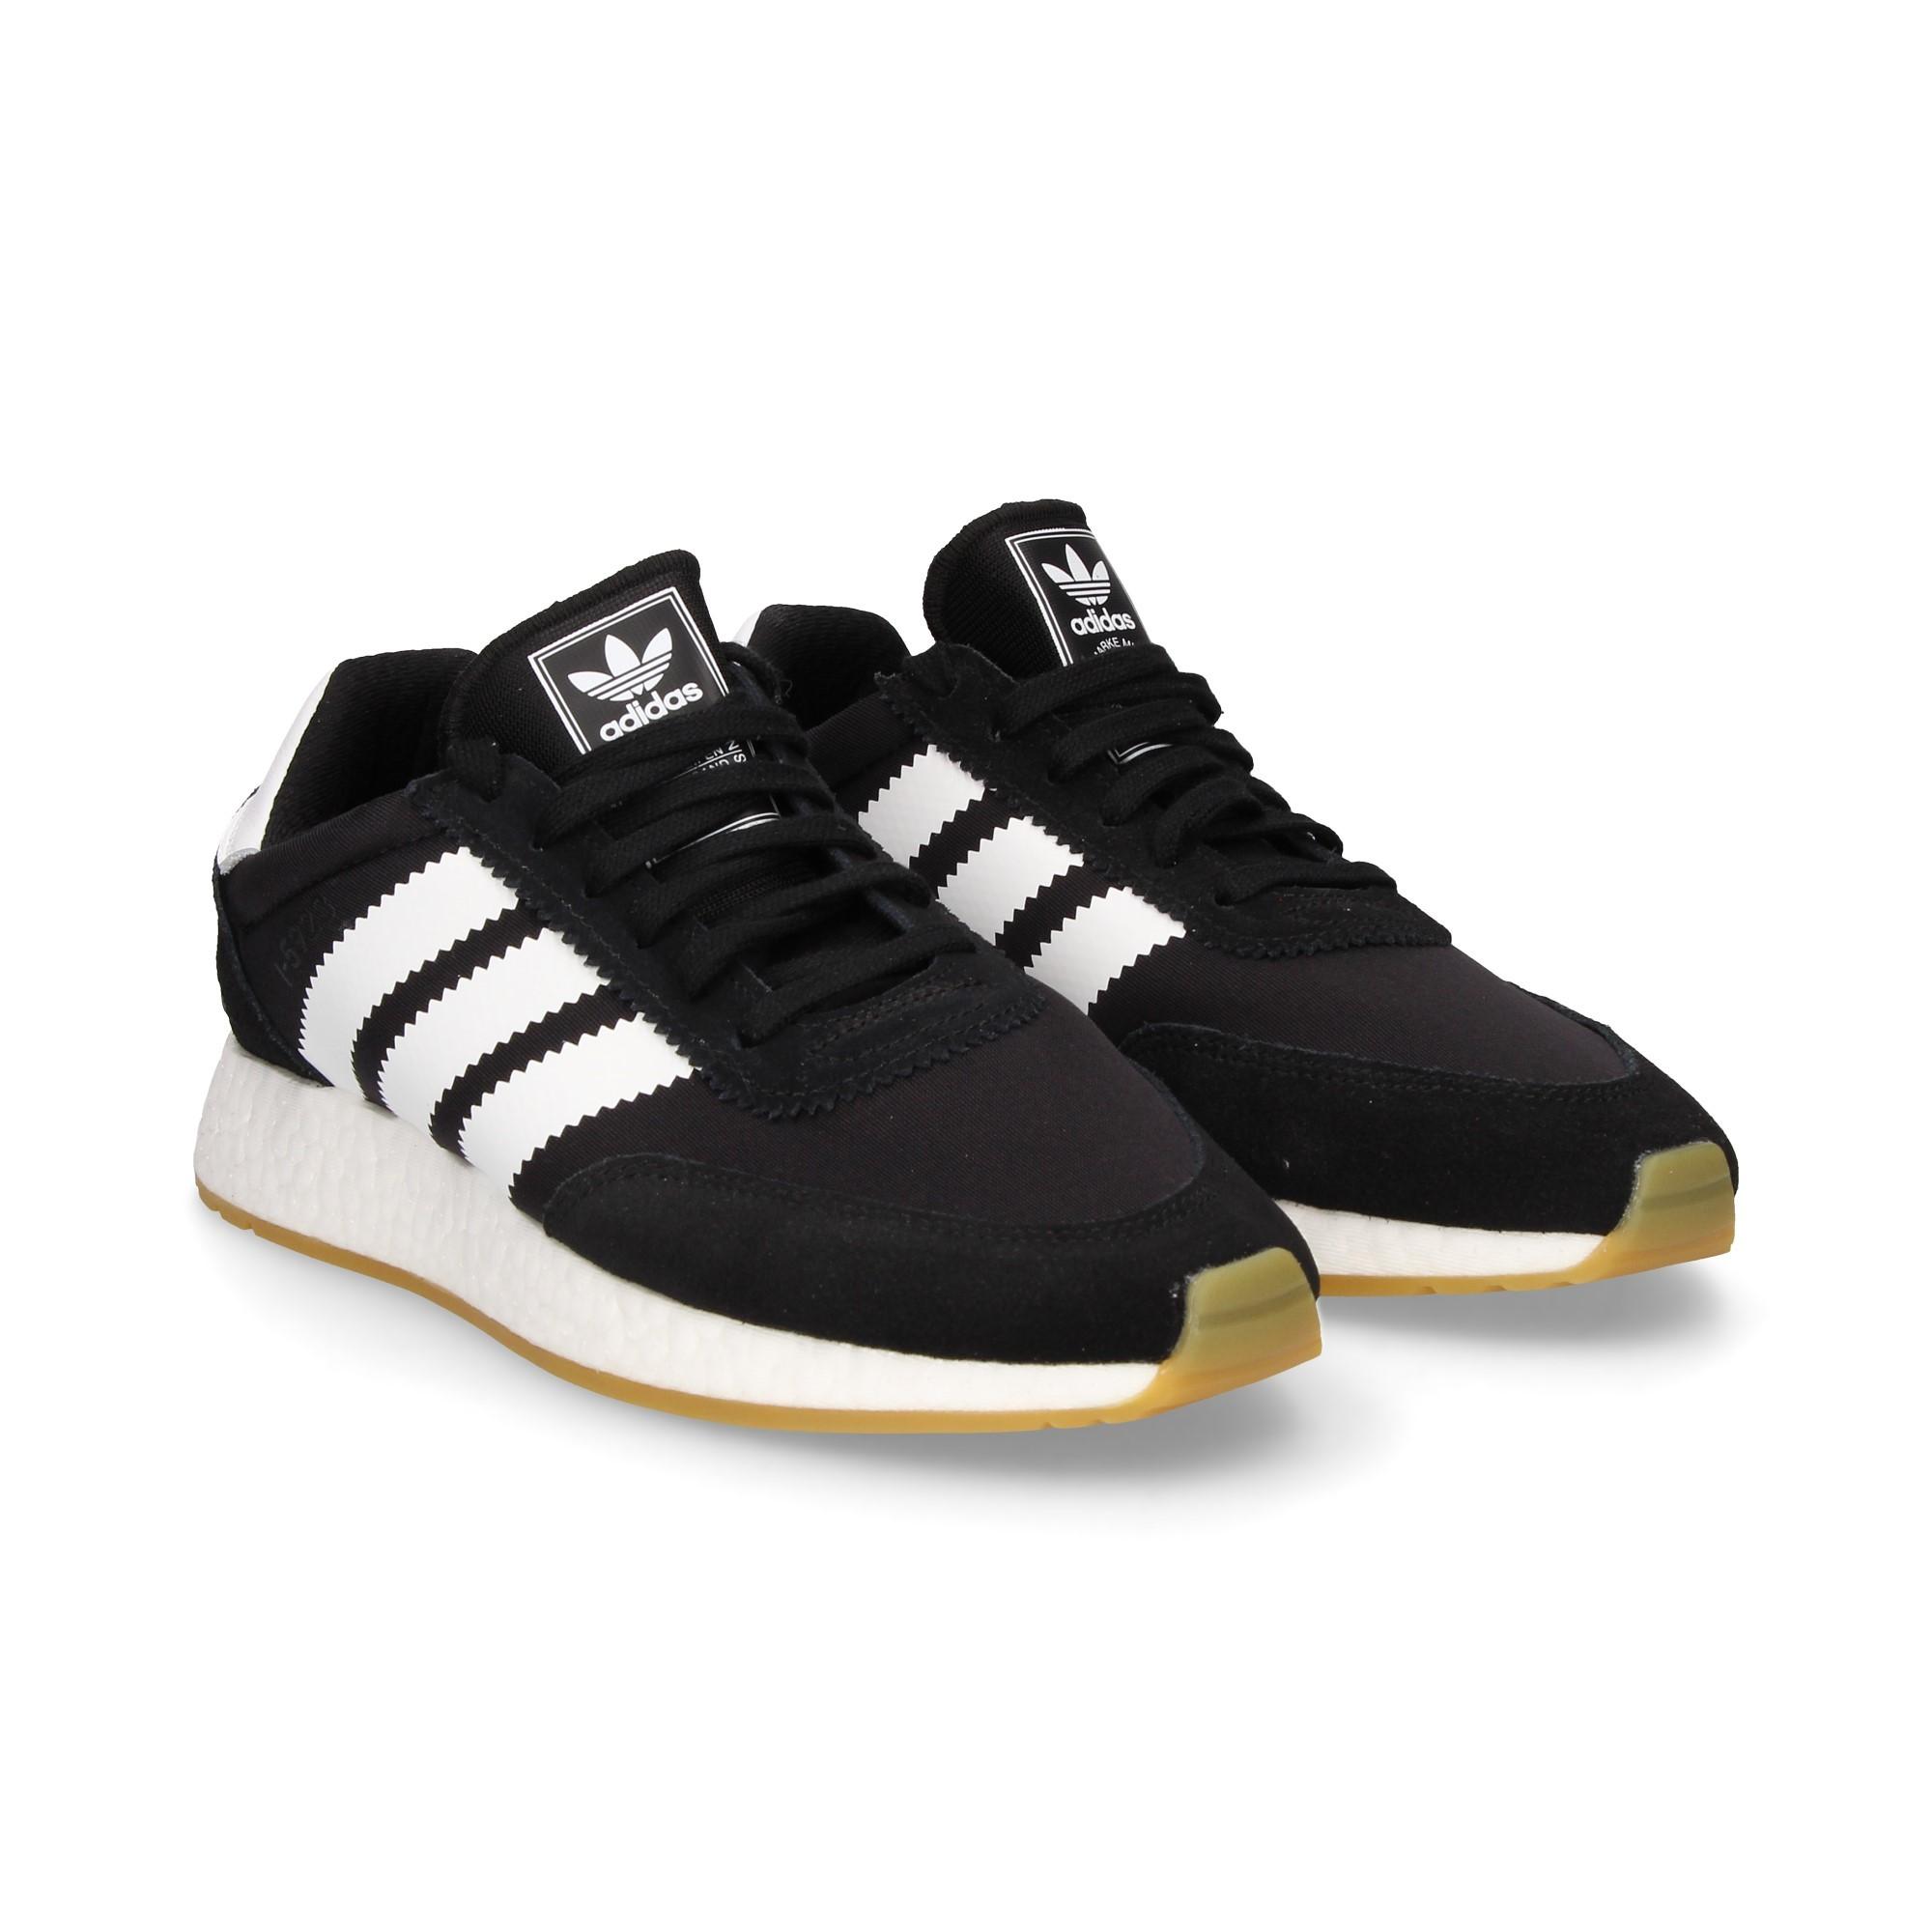 5923 Zapatillas Basico De Adidas I Negro Hombre 4R35ALqj